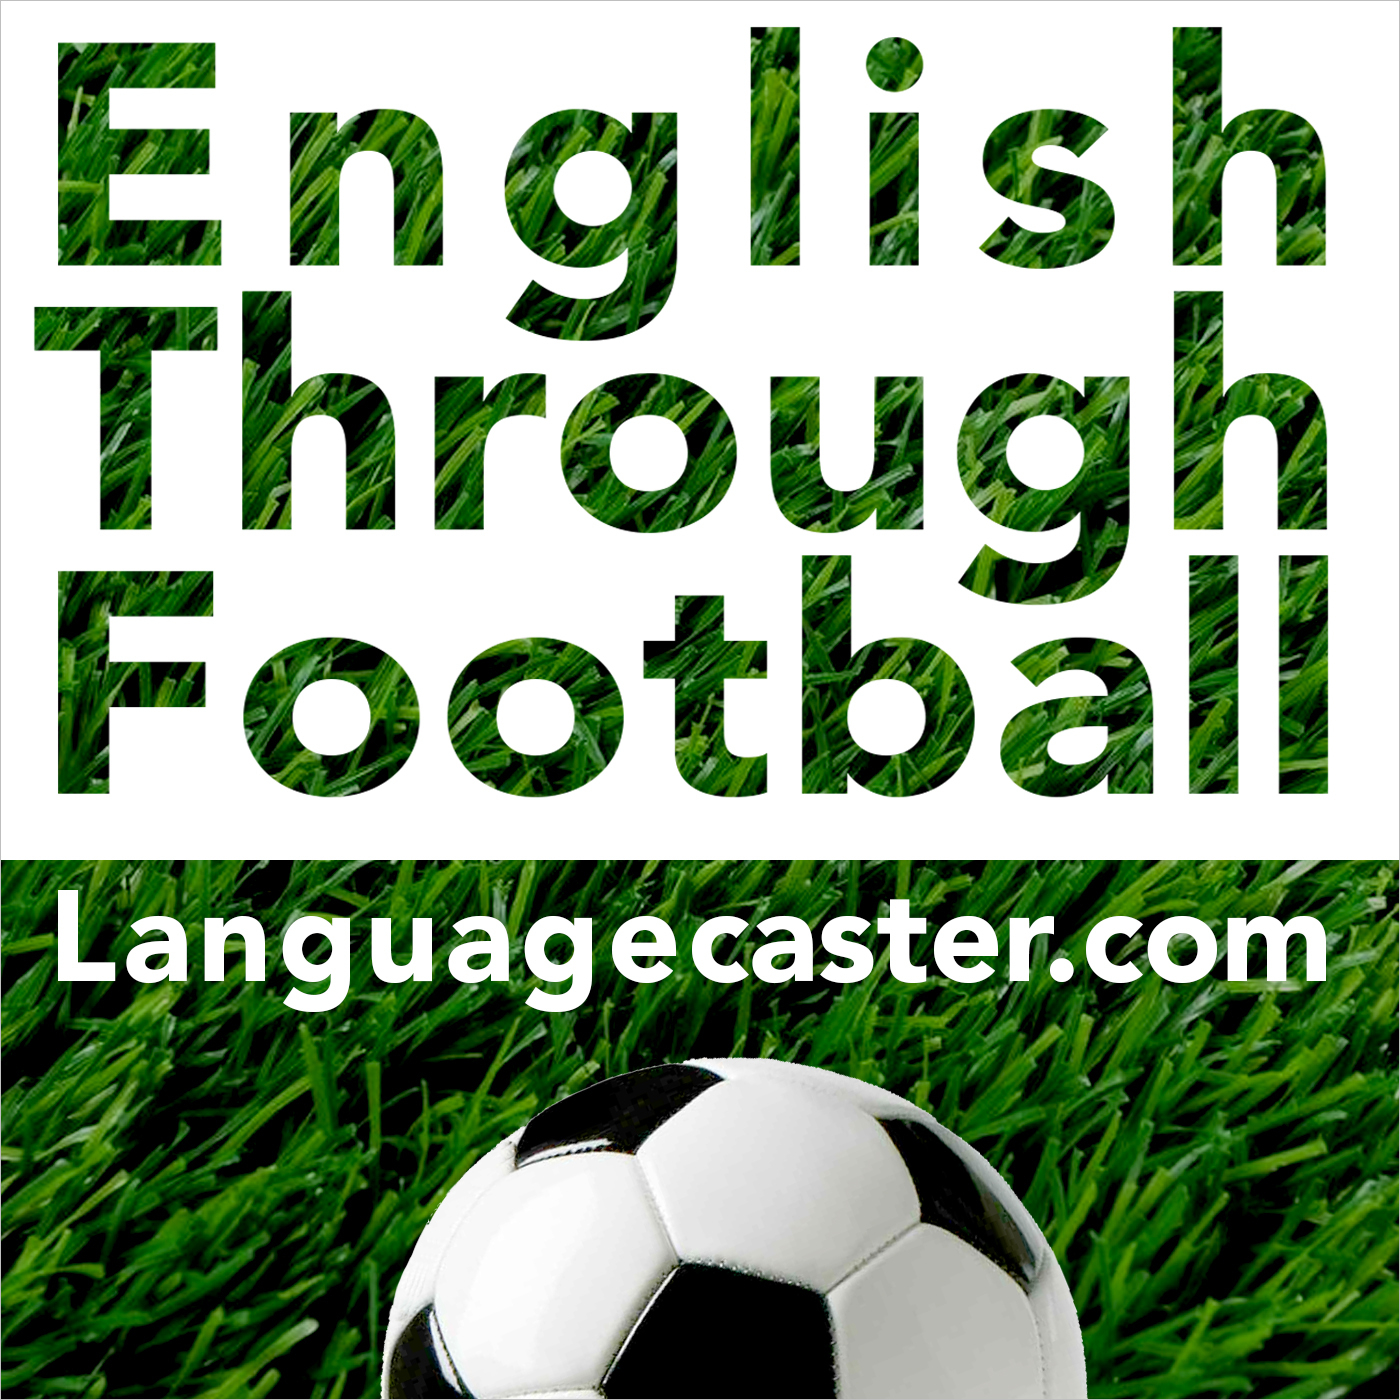 Learn English Through Football Podcast